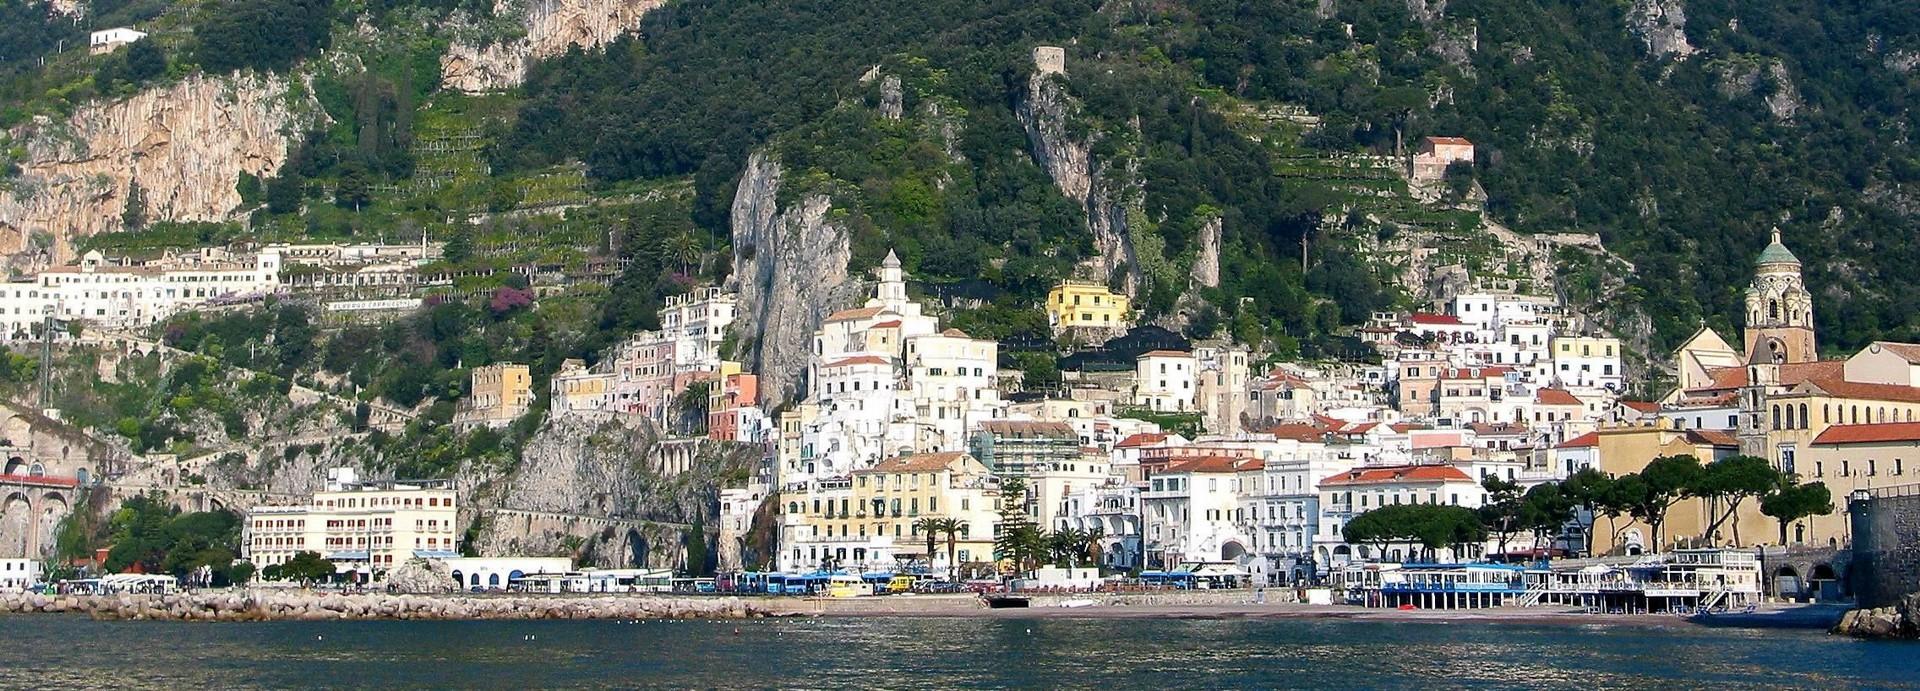 Amalfi04.jpg - Italy - Amalfi Coast Walking - Guided Holiday - Walking